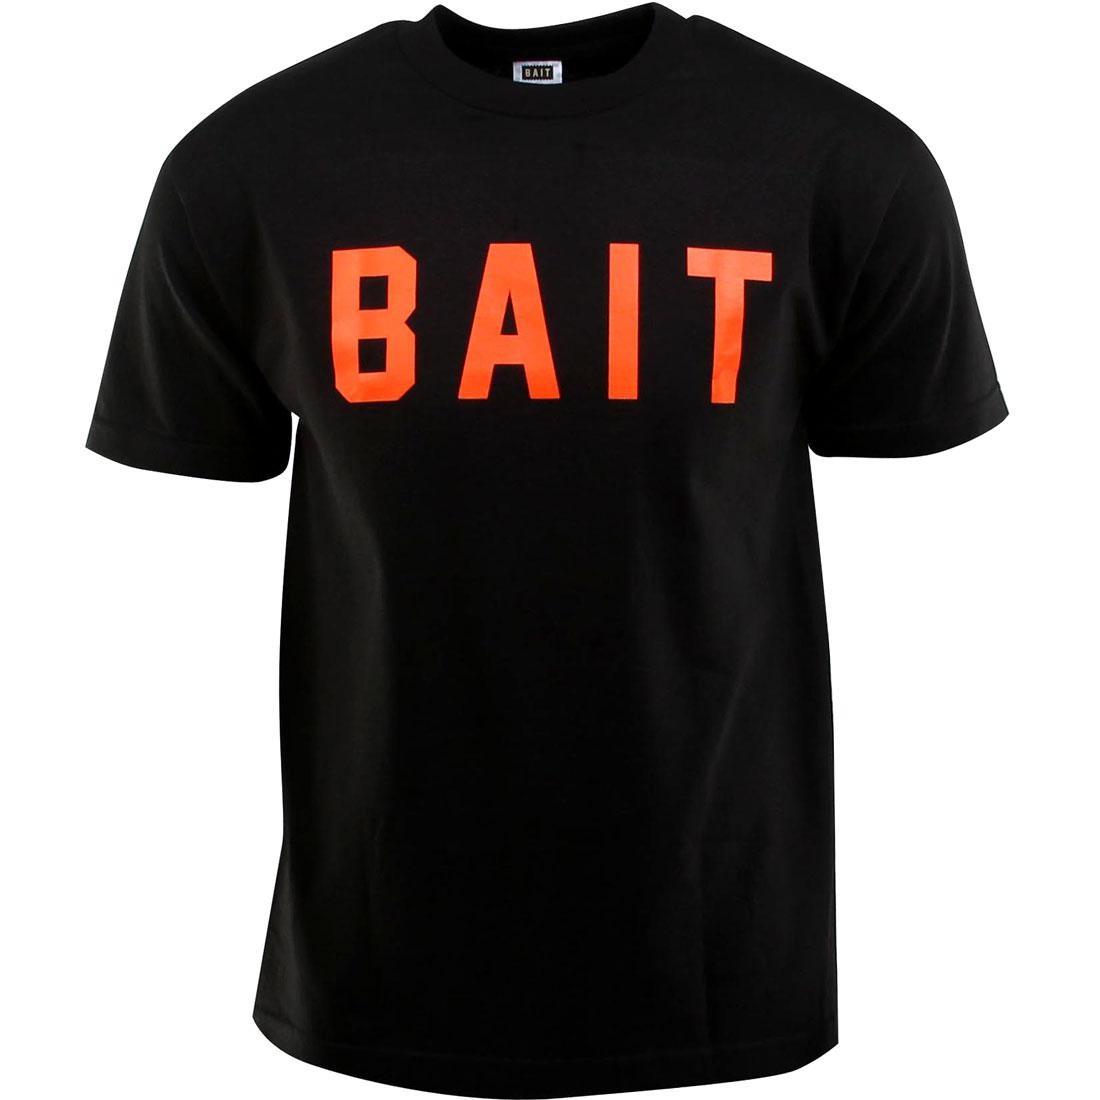 BAIT Logo Tee (black / orange)